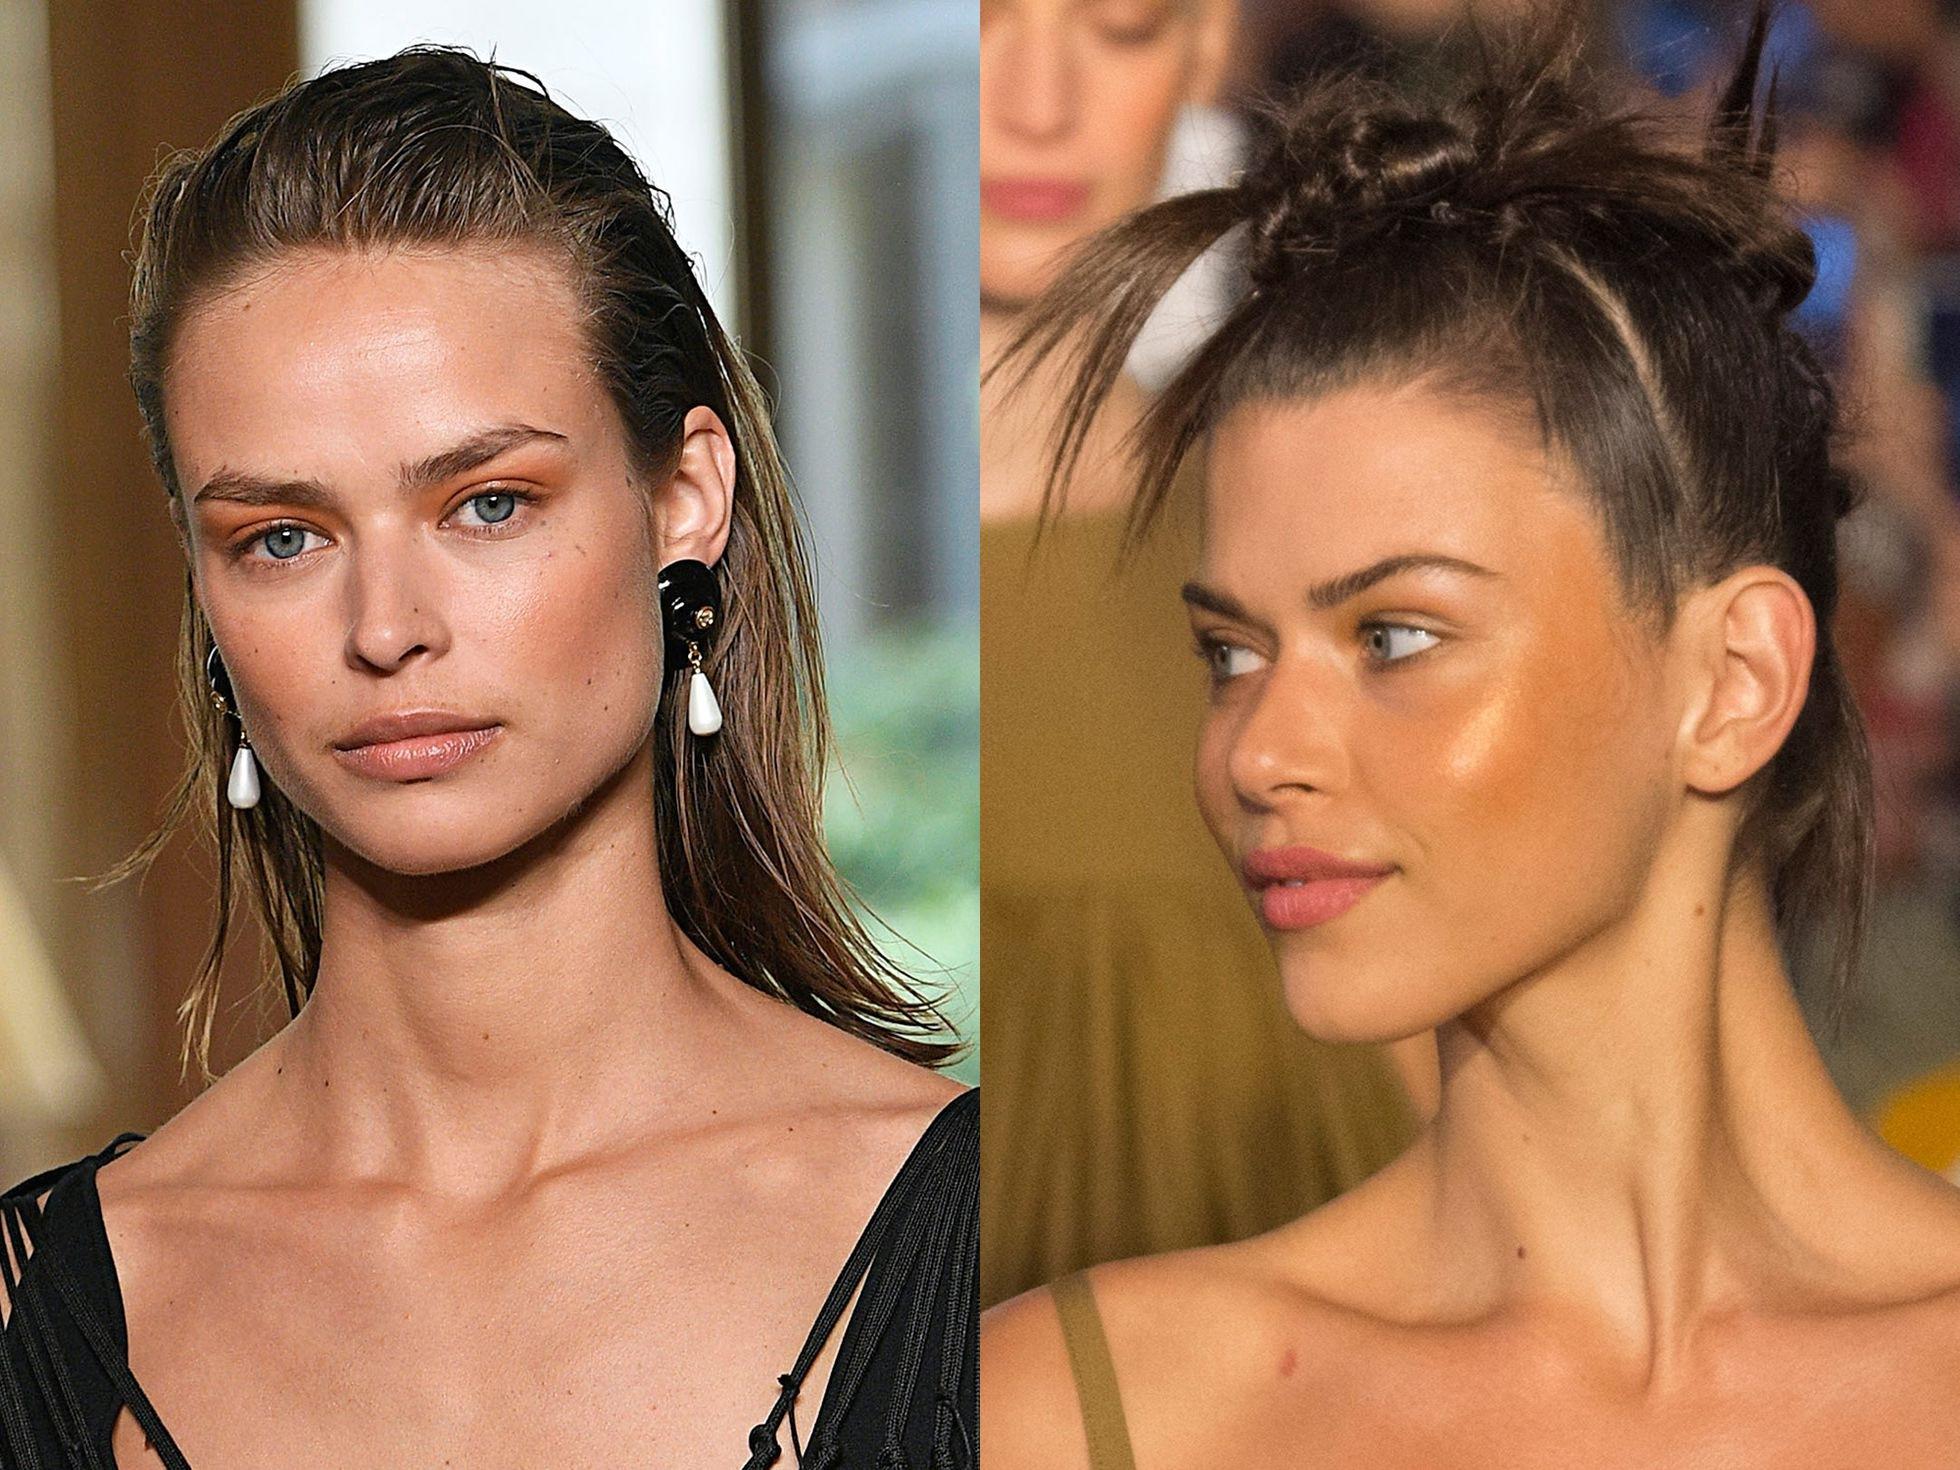 spring-summer-2019-makeup-trends-sunkissed-skin-altuzarra-getty-1538654997-horz.jpg